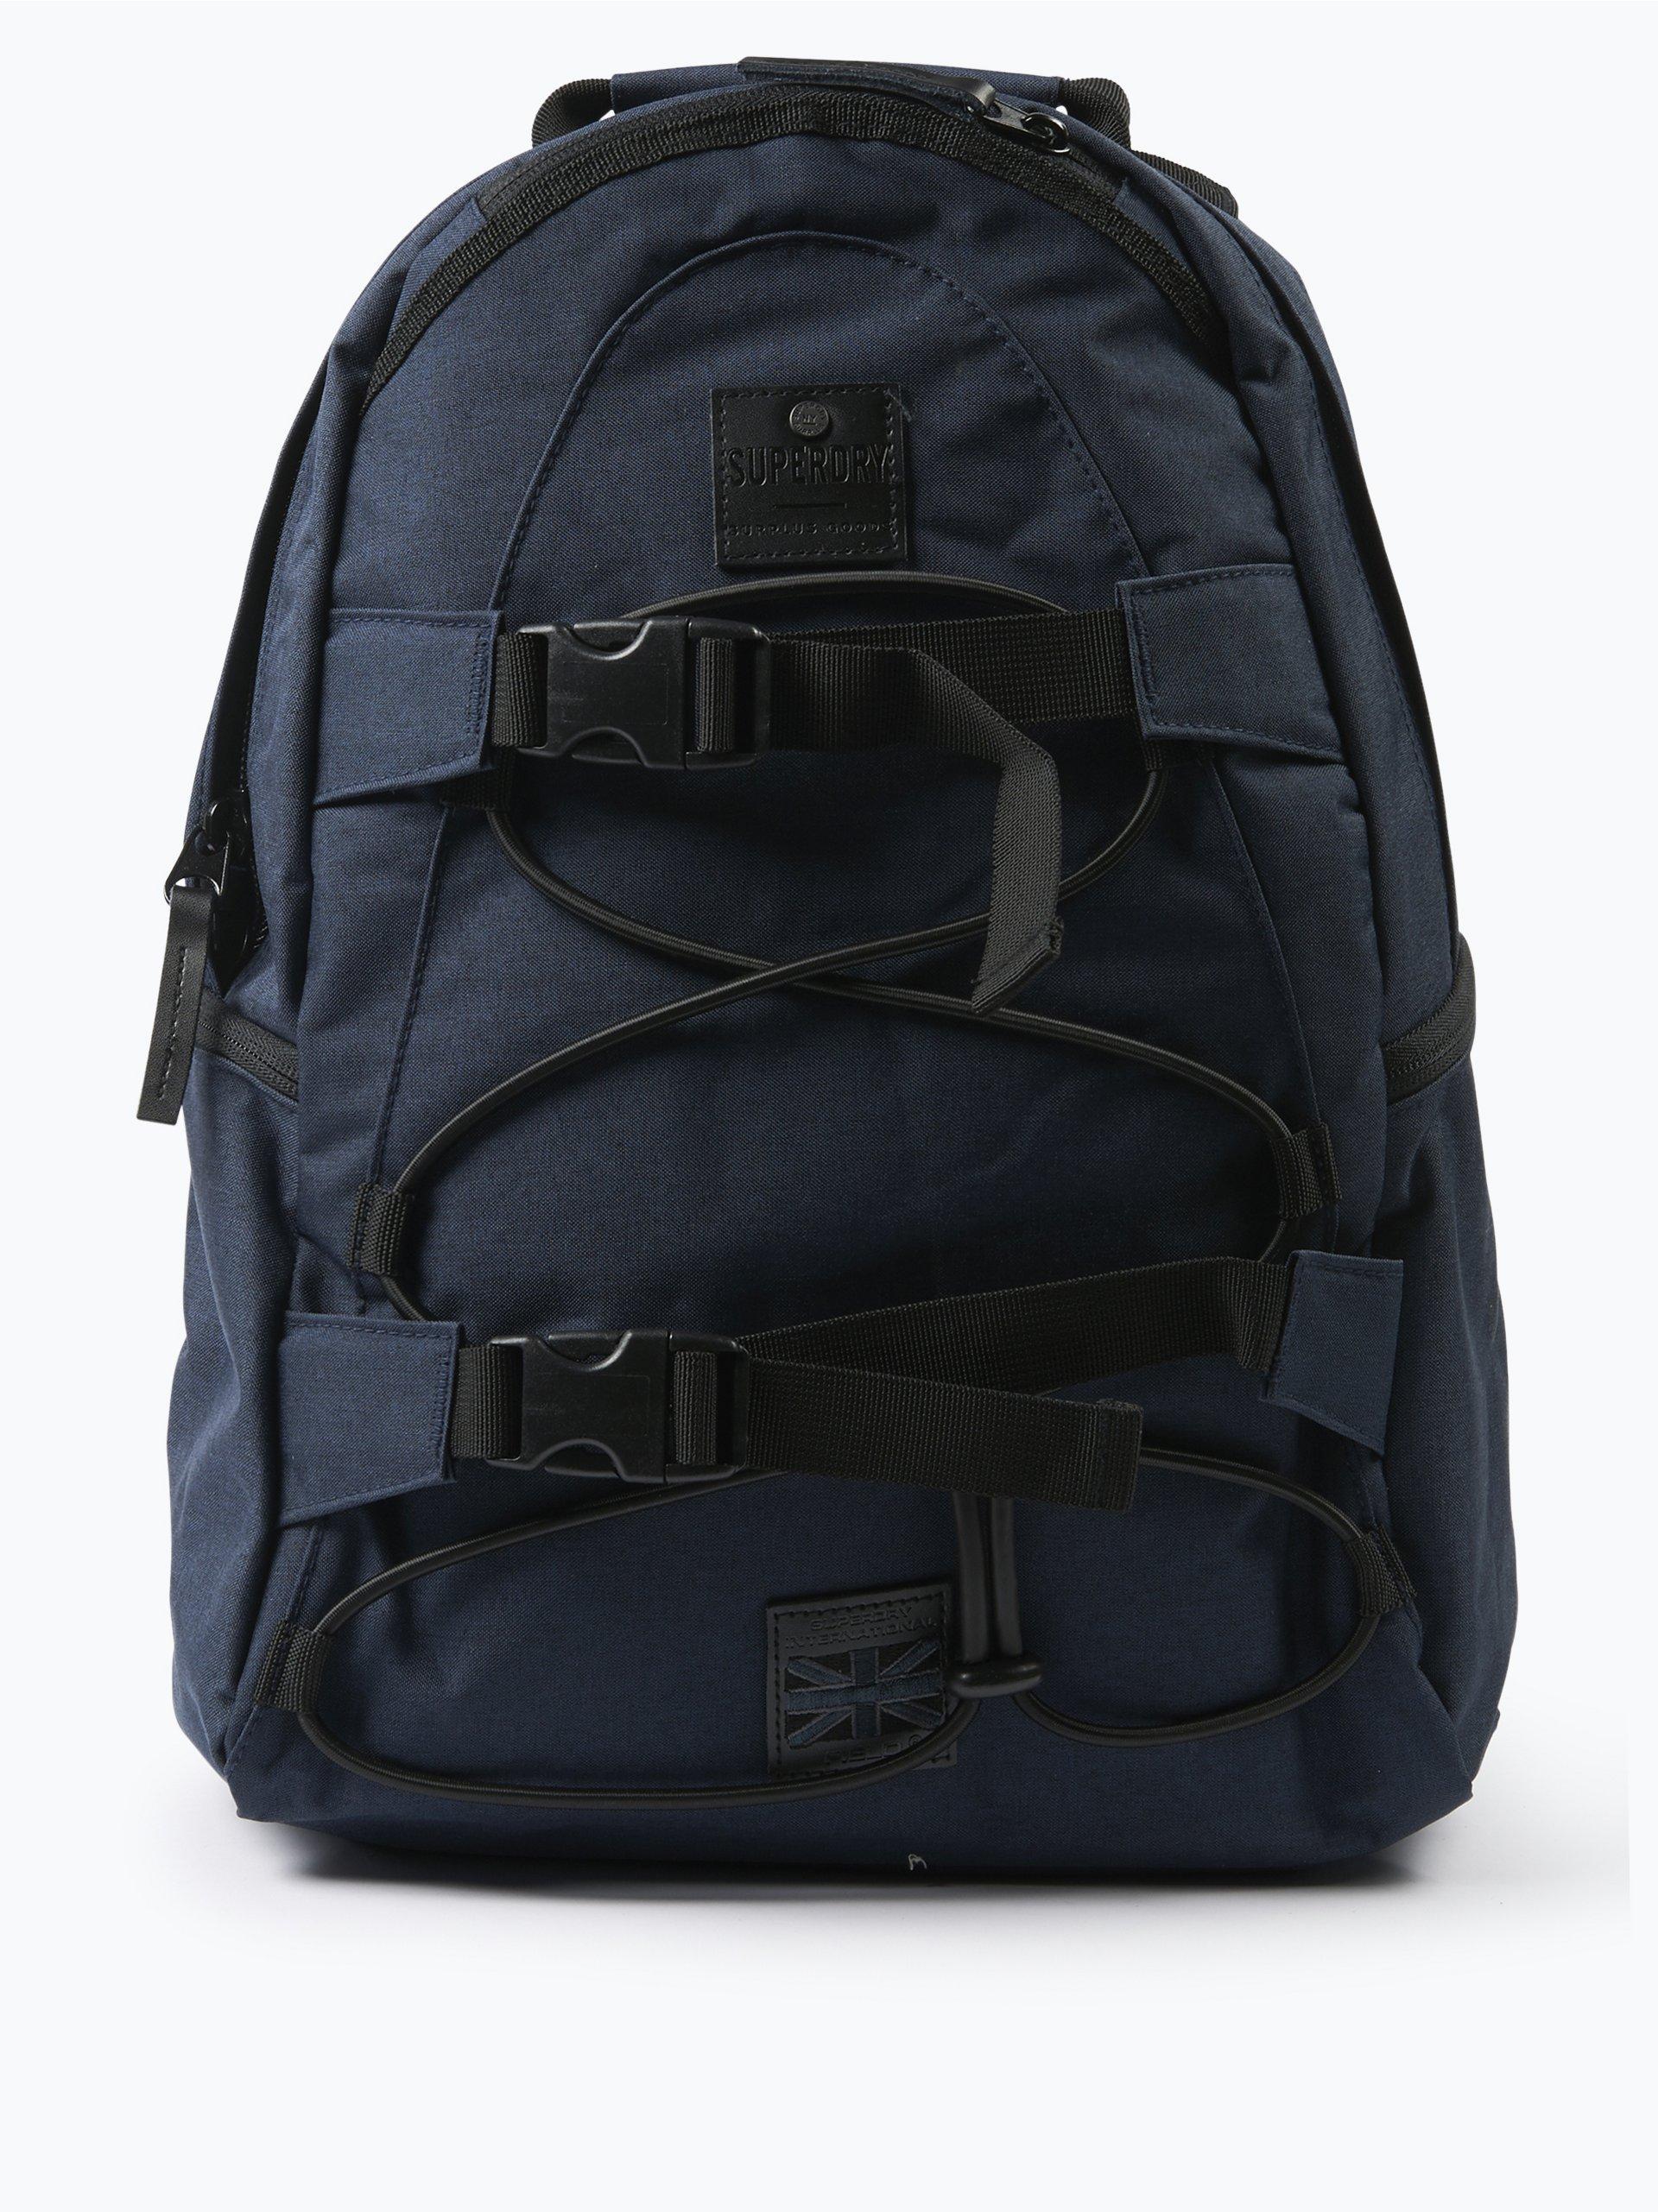 superdry herren rucksack surplus marine uni online. Black Bedroom Furniture Sets. Home Design Ideas